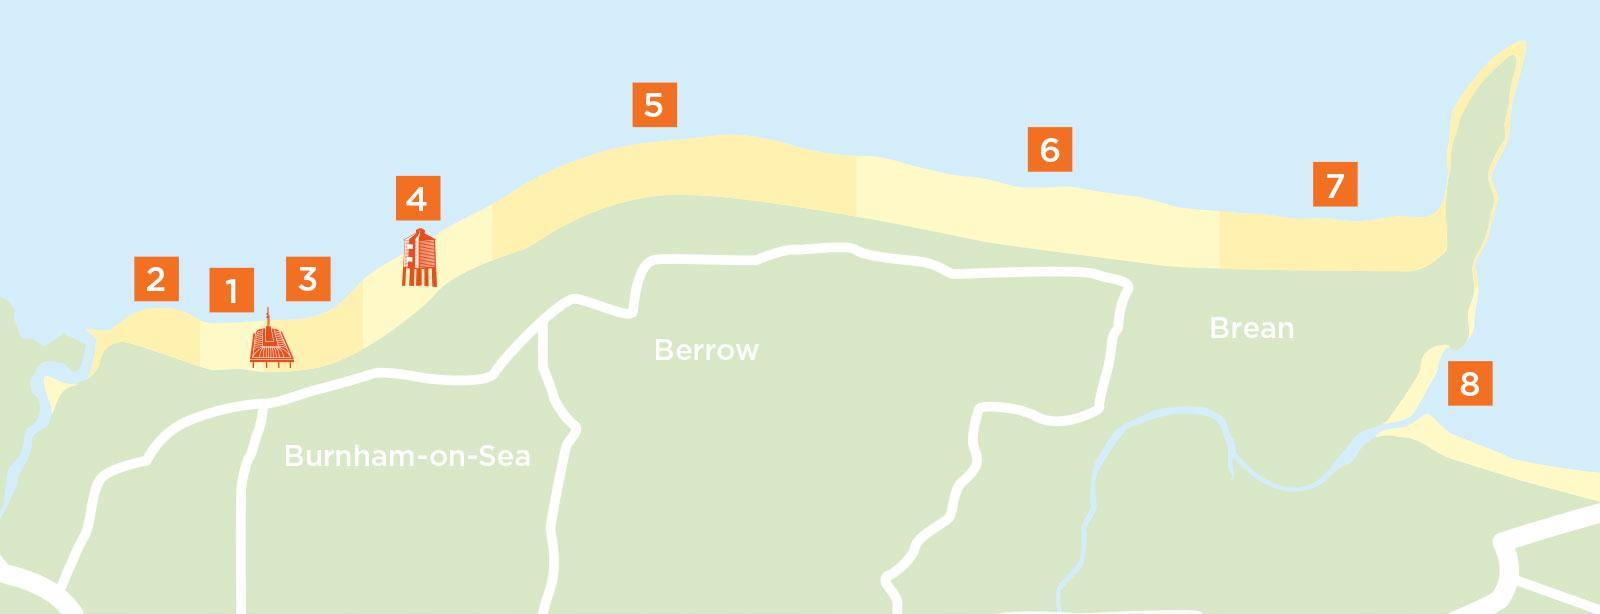 BARB-Search-and-rescue-burnham-brean-berrow-beach